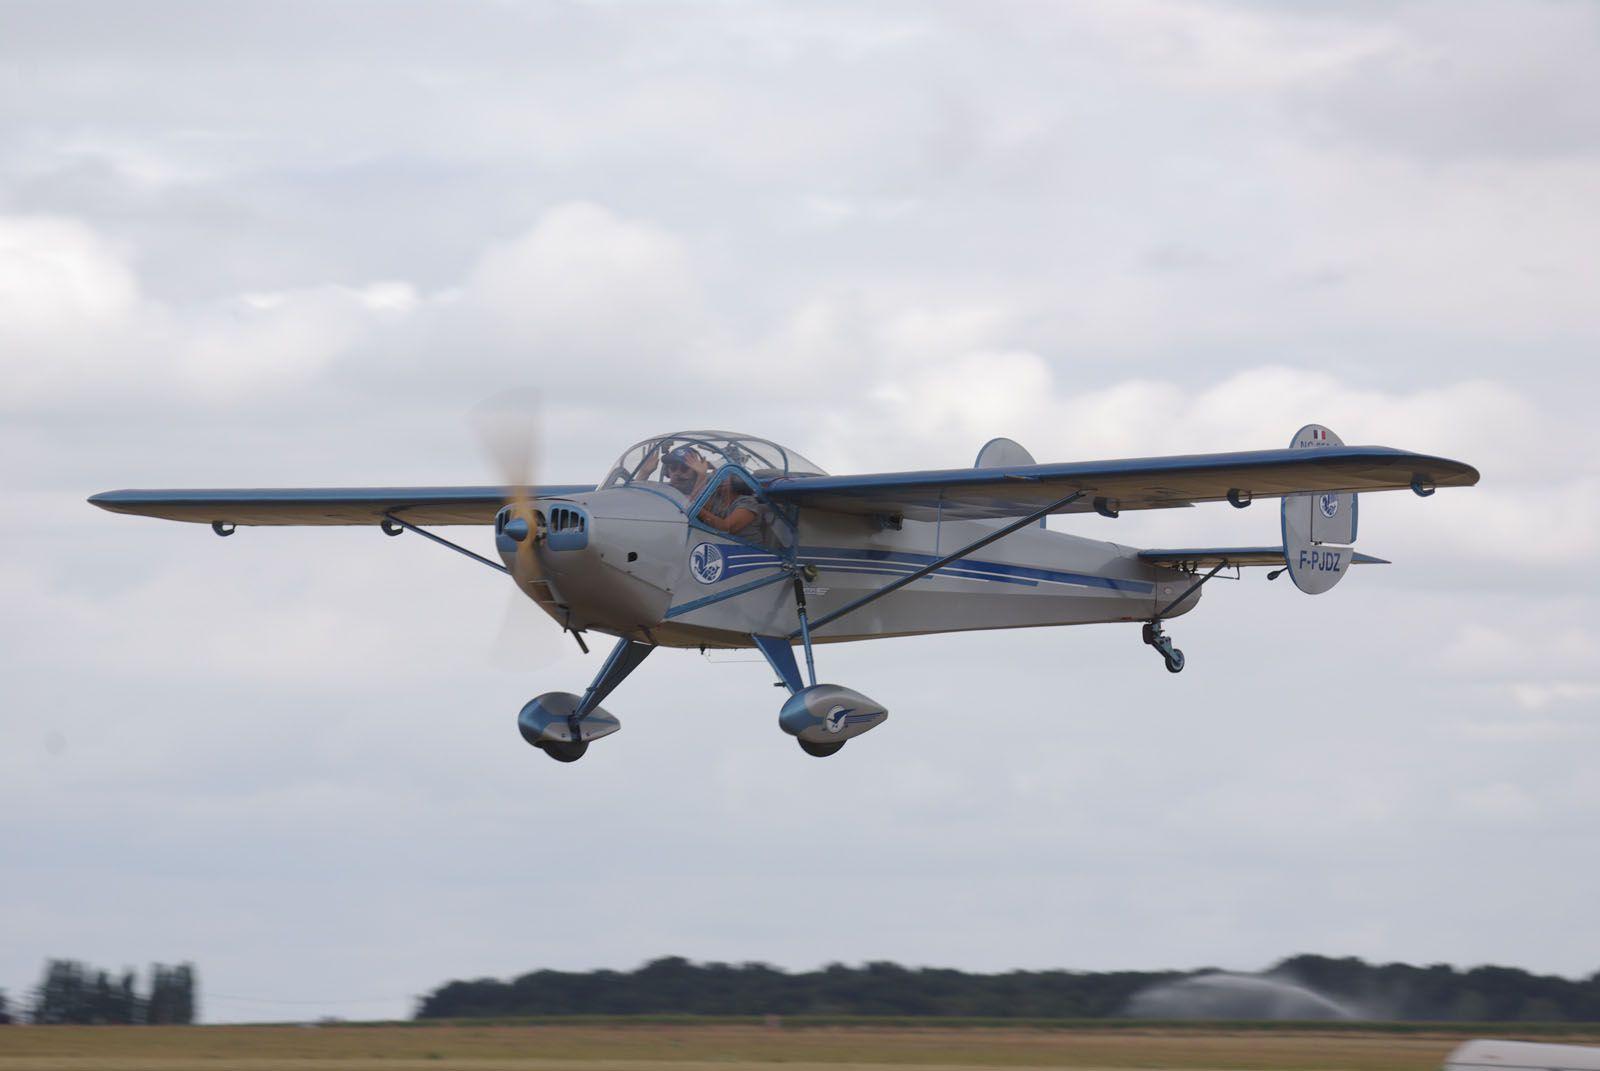 Le SNCAC NC-858S N°64 F-PJDZ de 1950.